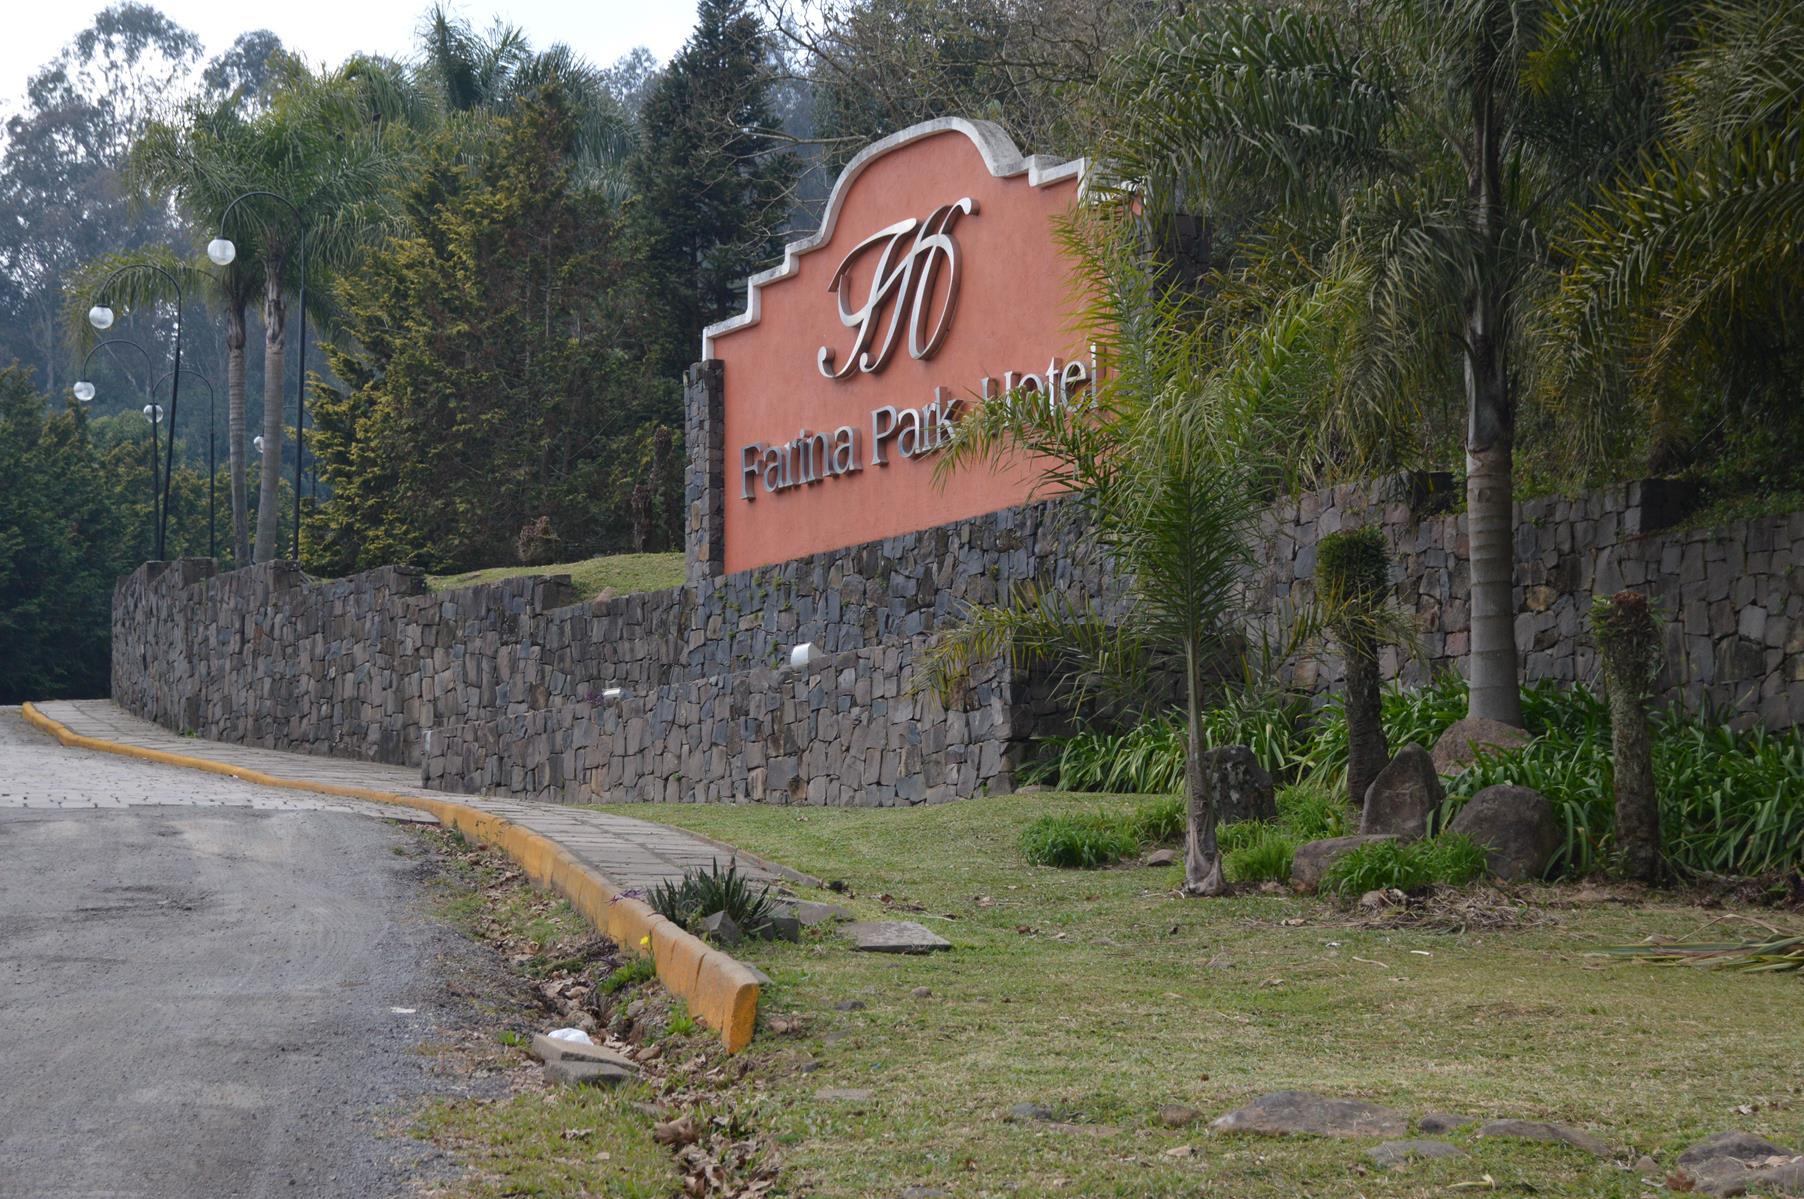 Farina Park Hotel, em Farroupilha